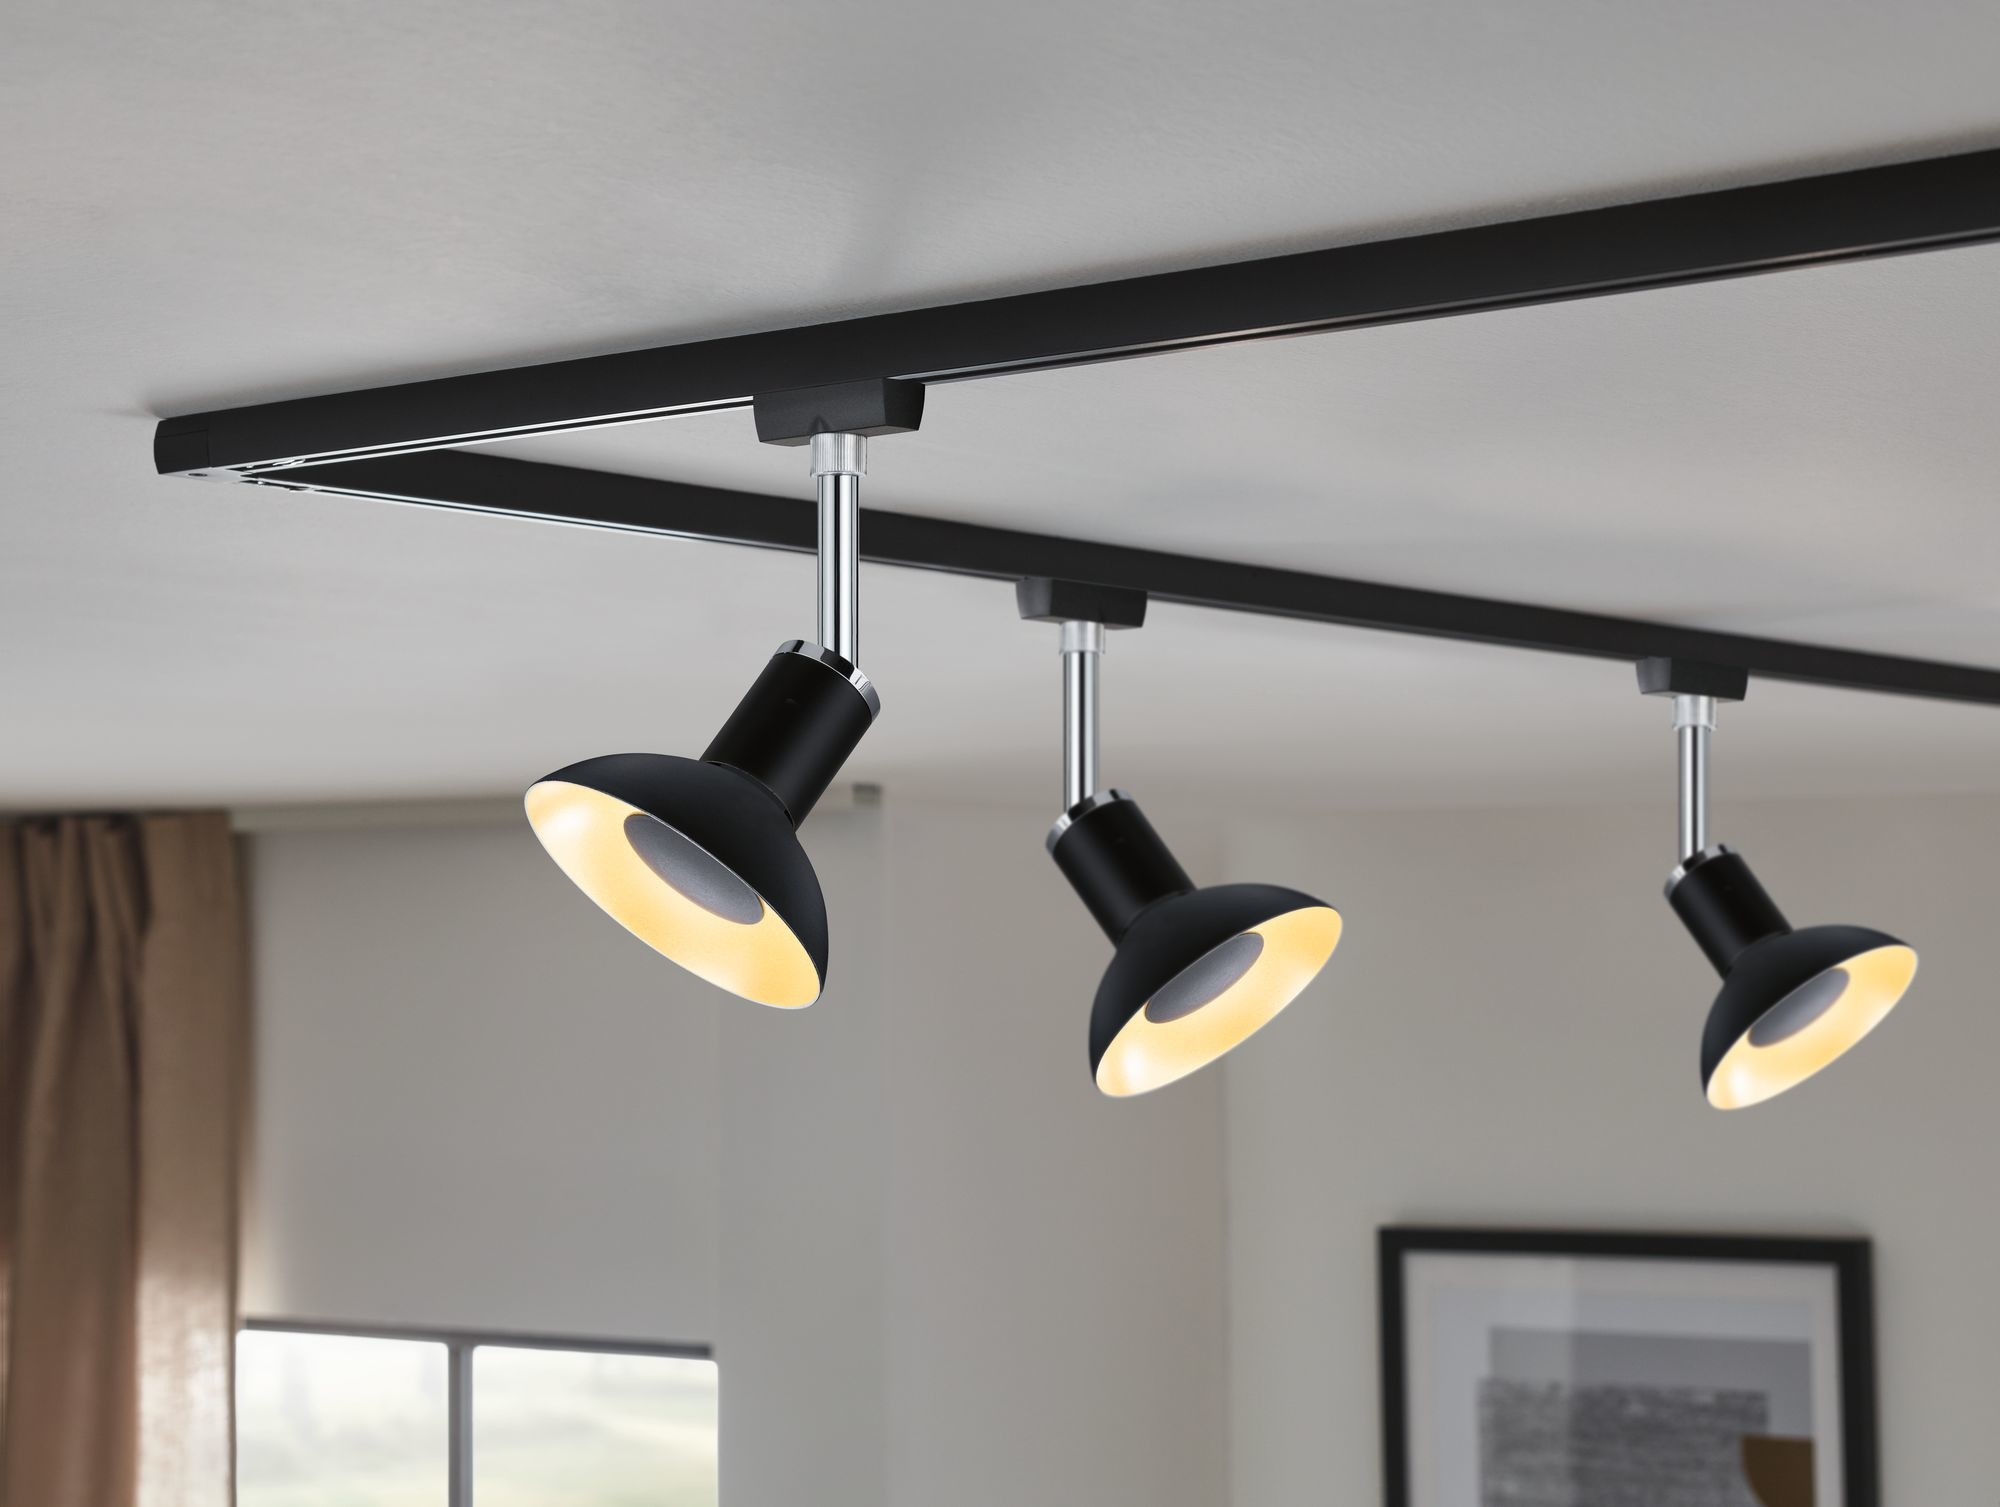 Paulmann LED Reflektor Schwarz#Gold 4,9W GU10 230V 3-Stufen-dimmbar